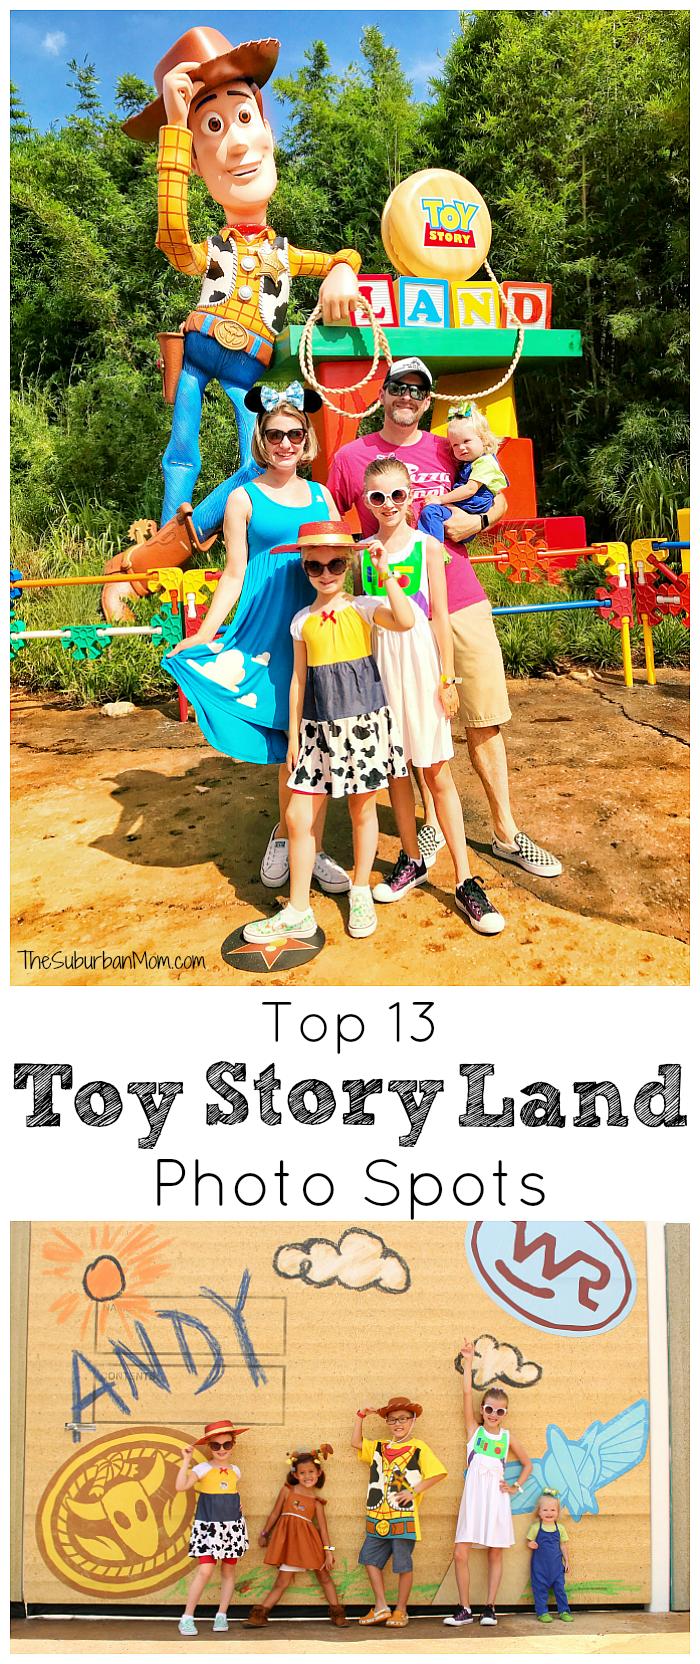 Top 13 Toy Story Land Photo Spots